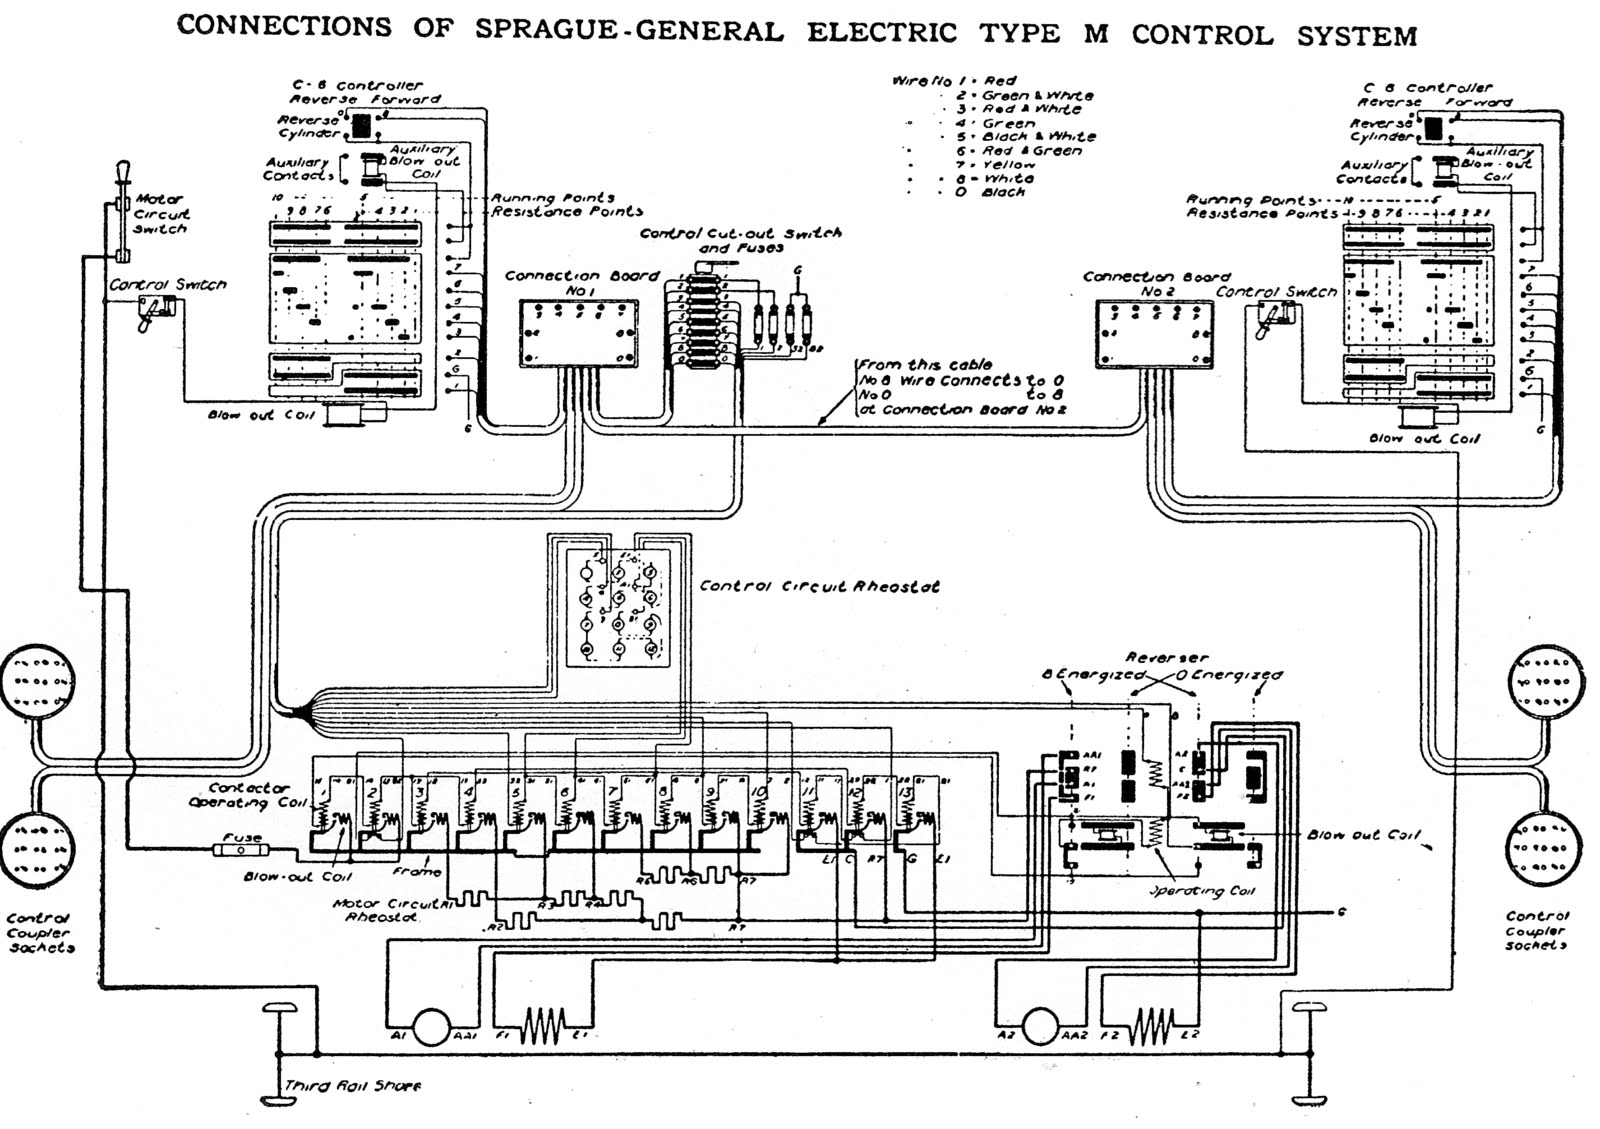 2004 Saturn Sl2 Engine Diagram Starter Auto Electrical Wiring 1998 L100 Autosmoviles Com